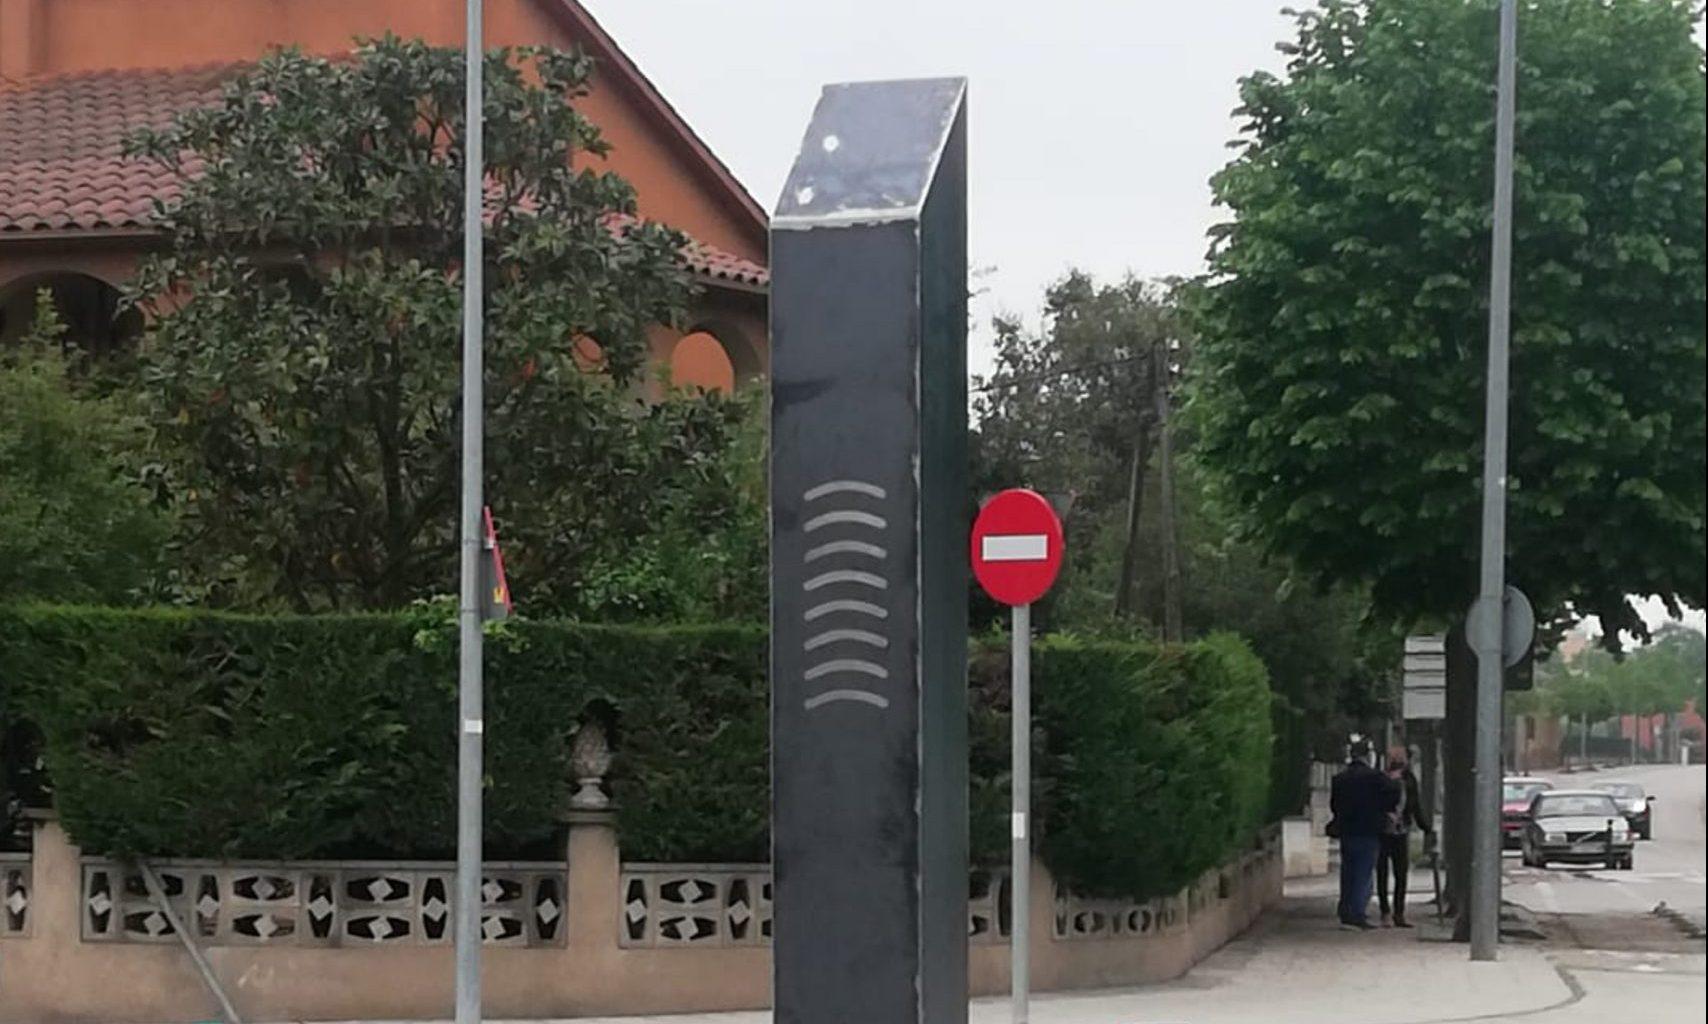 El monòlit aparegut a Celrà el 30 d'abril de 2021 / ACN